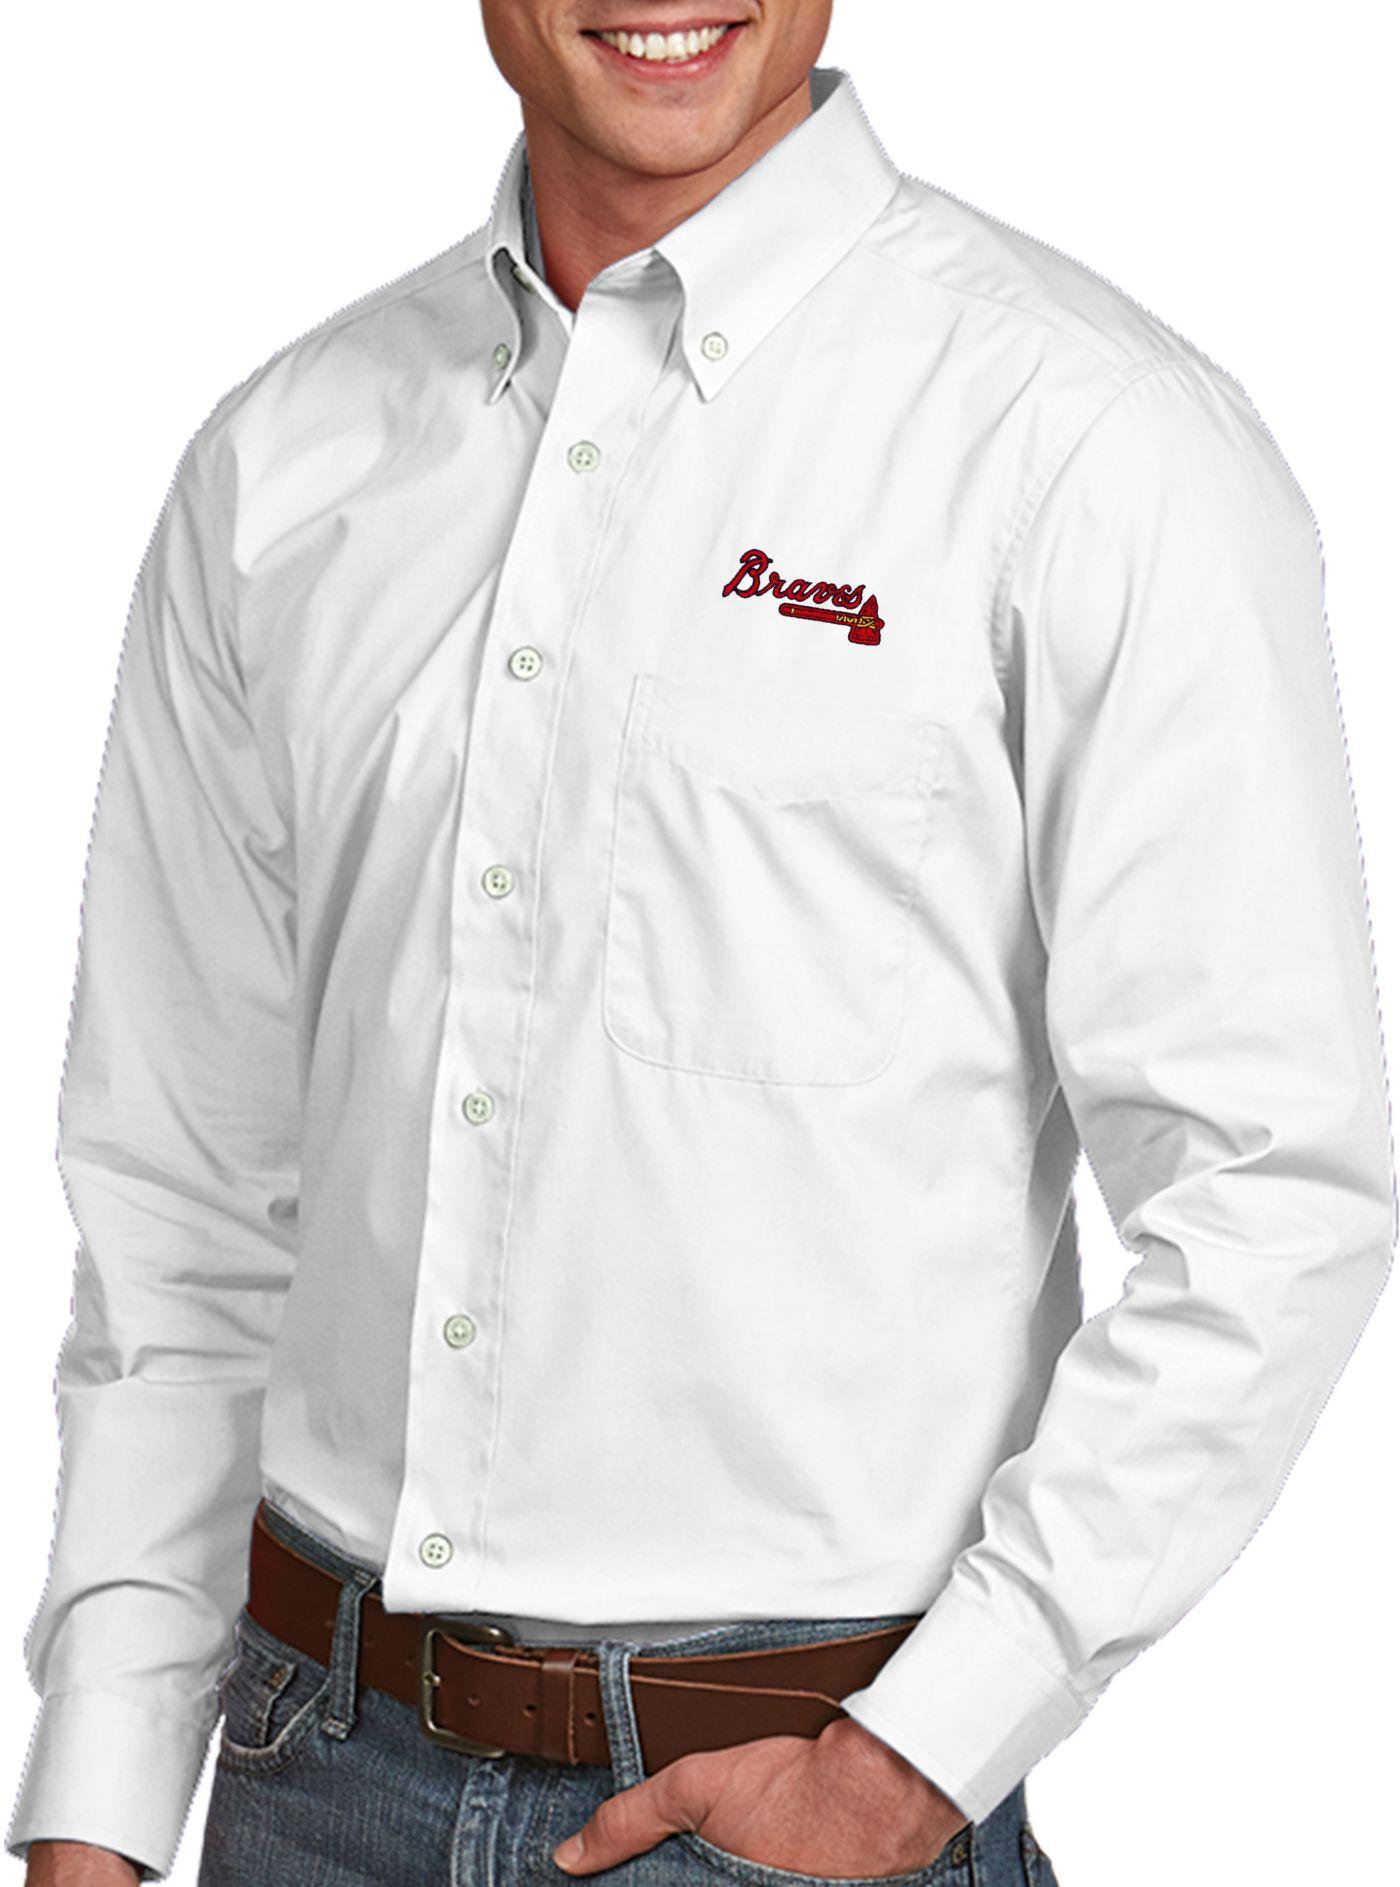 Antigua Men's Atlanta Braves Dynasty Button-Up White Long Sleeve Shirt